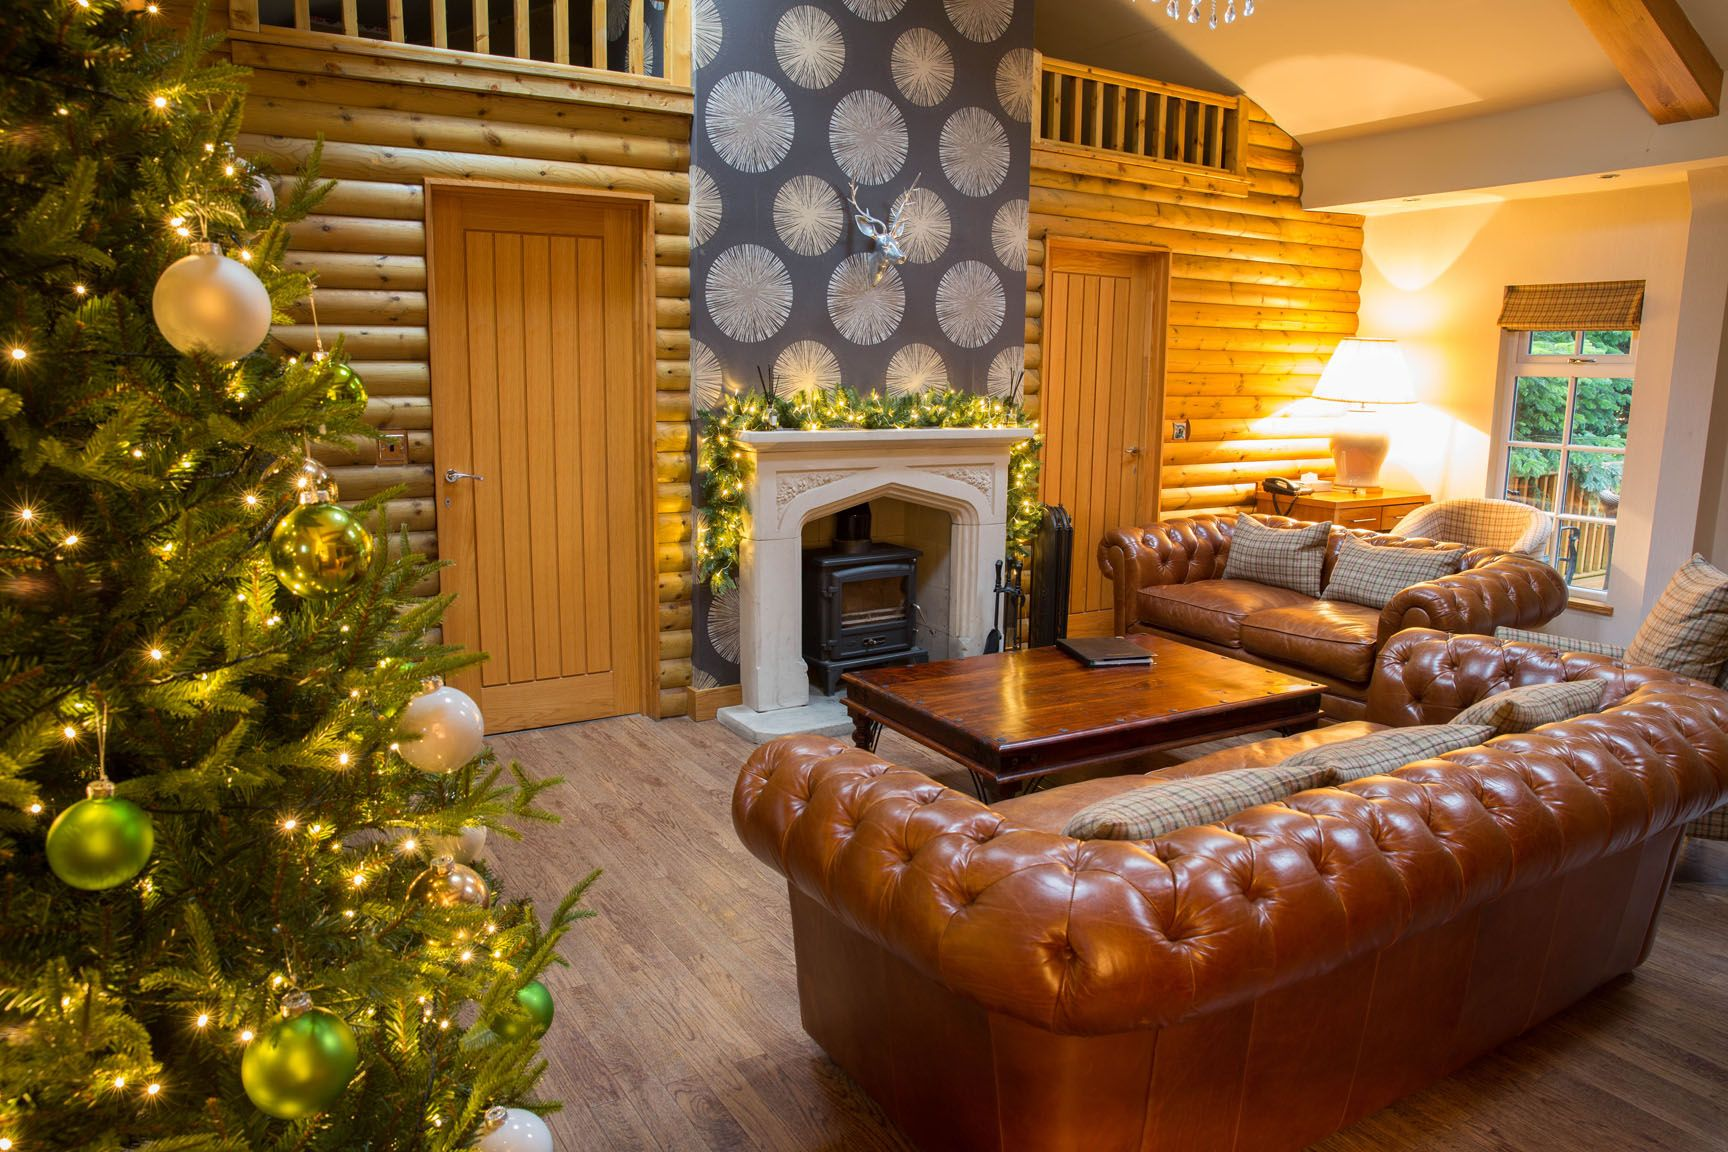 The Grand Fir Log cabin at Christmas